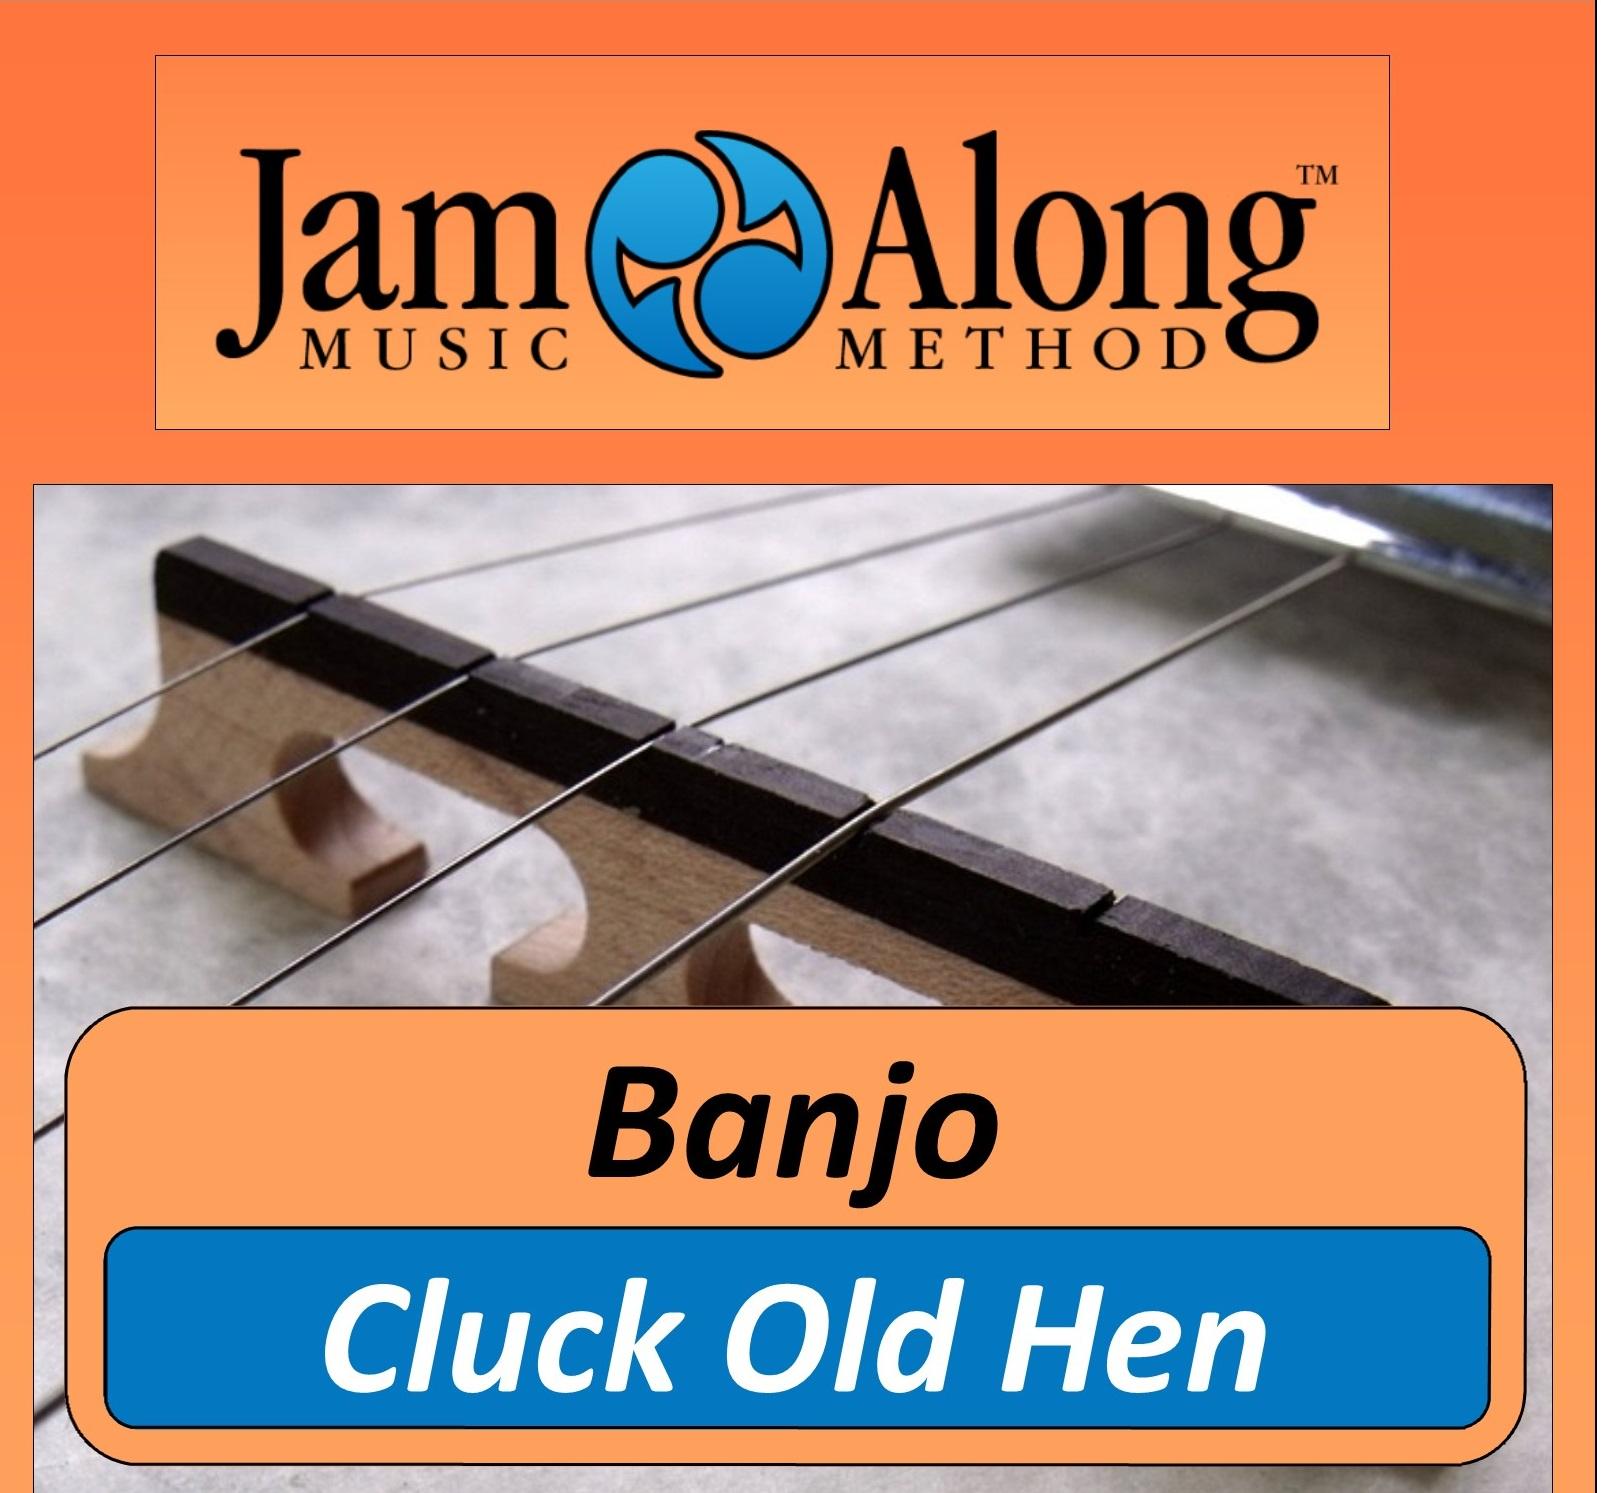 Cluck Old Hen - Banjo Lead